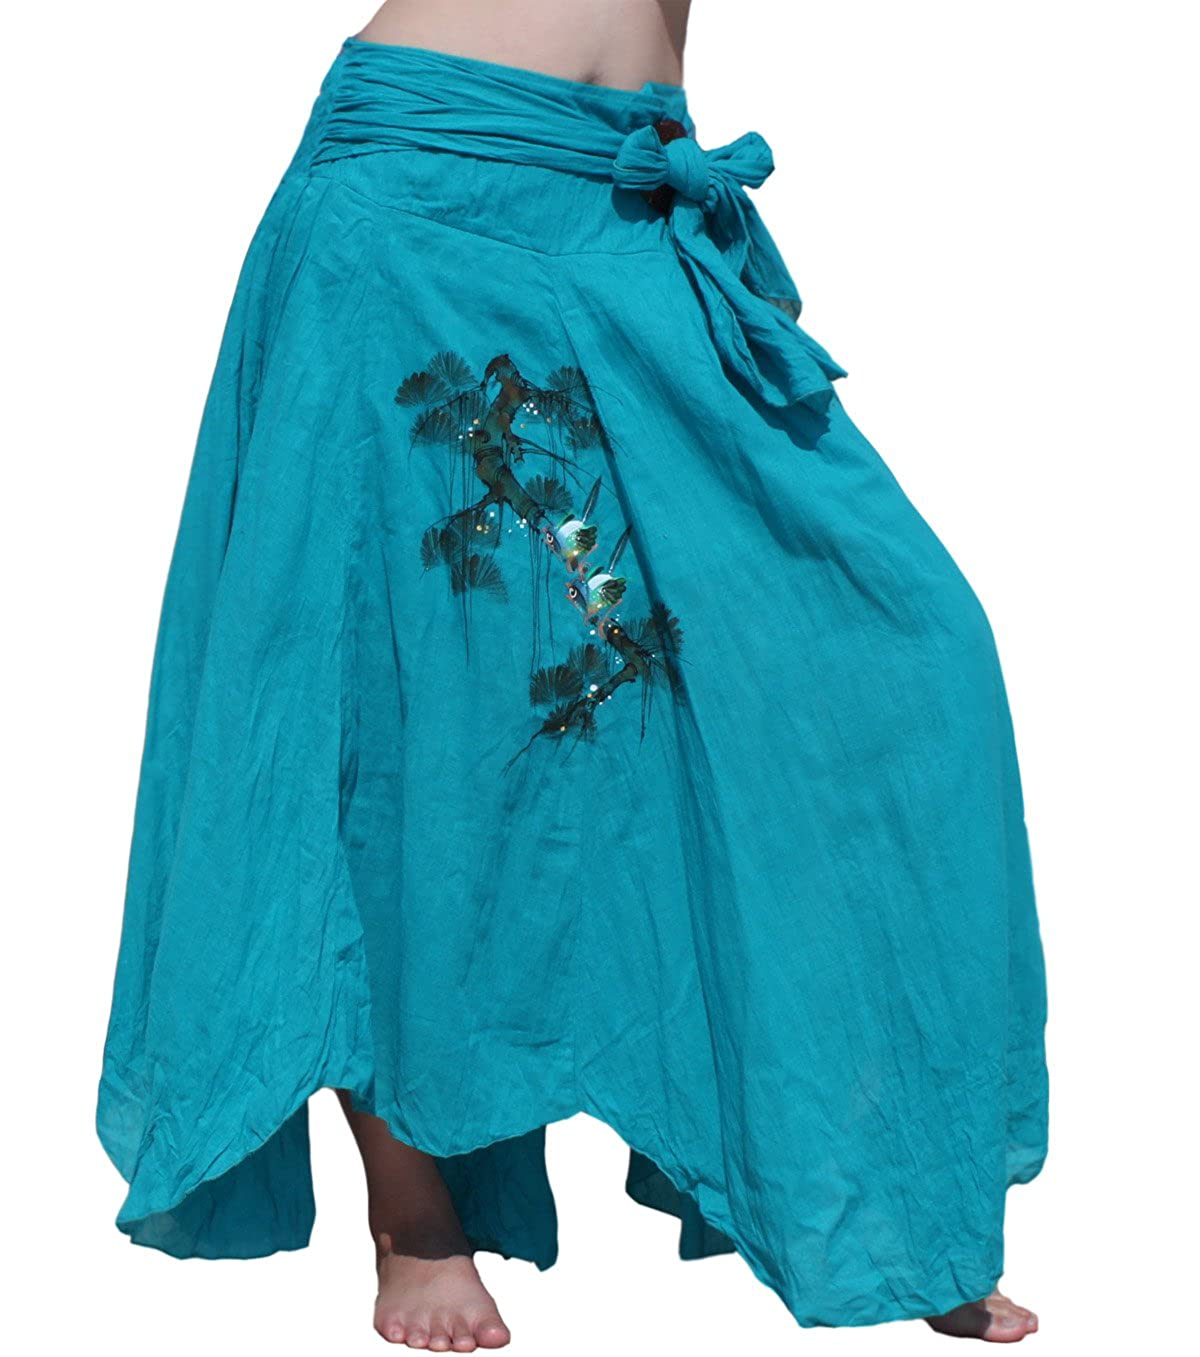 Raan Pah Muang Brand Cotton Coconut Buckle Ragged Hem Green Painted Bird Skirt